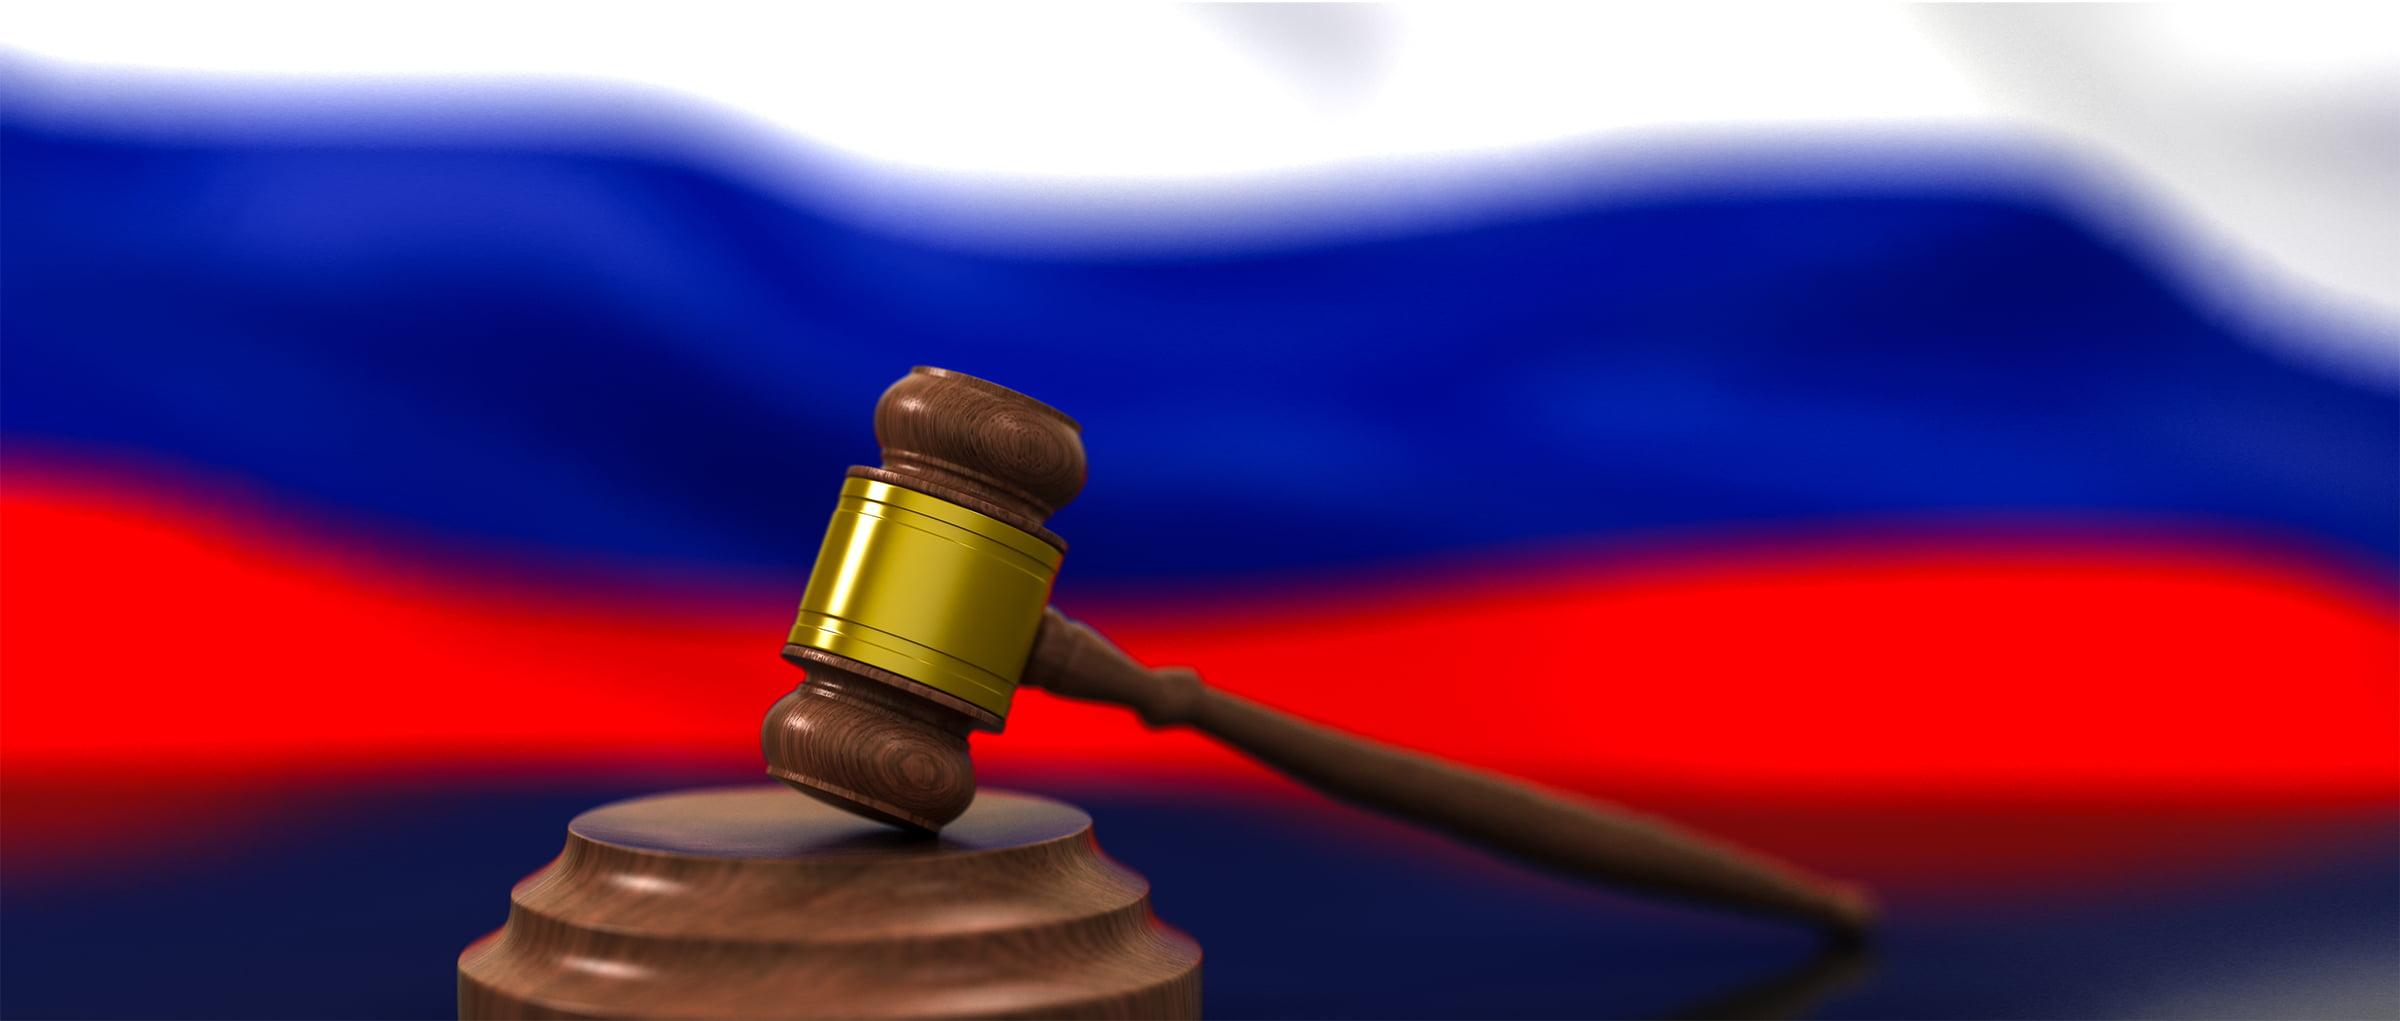 Législation russe